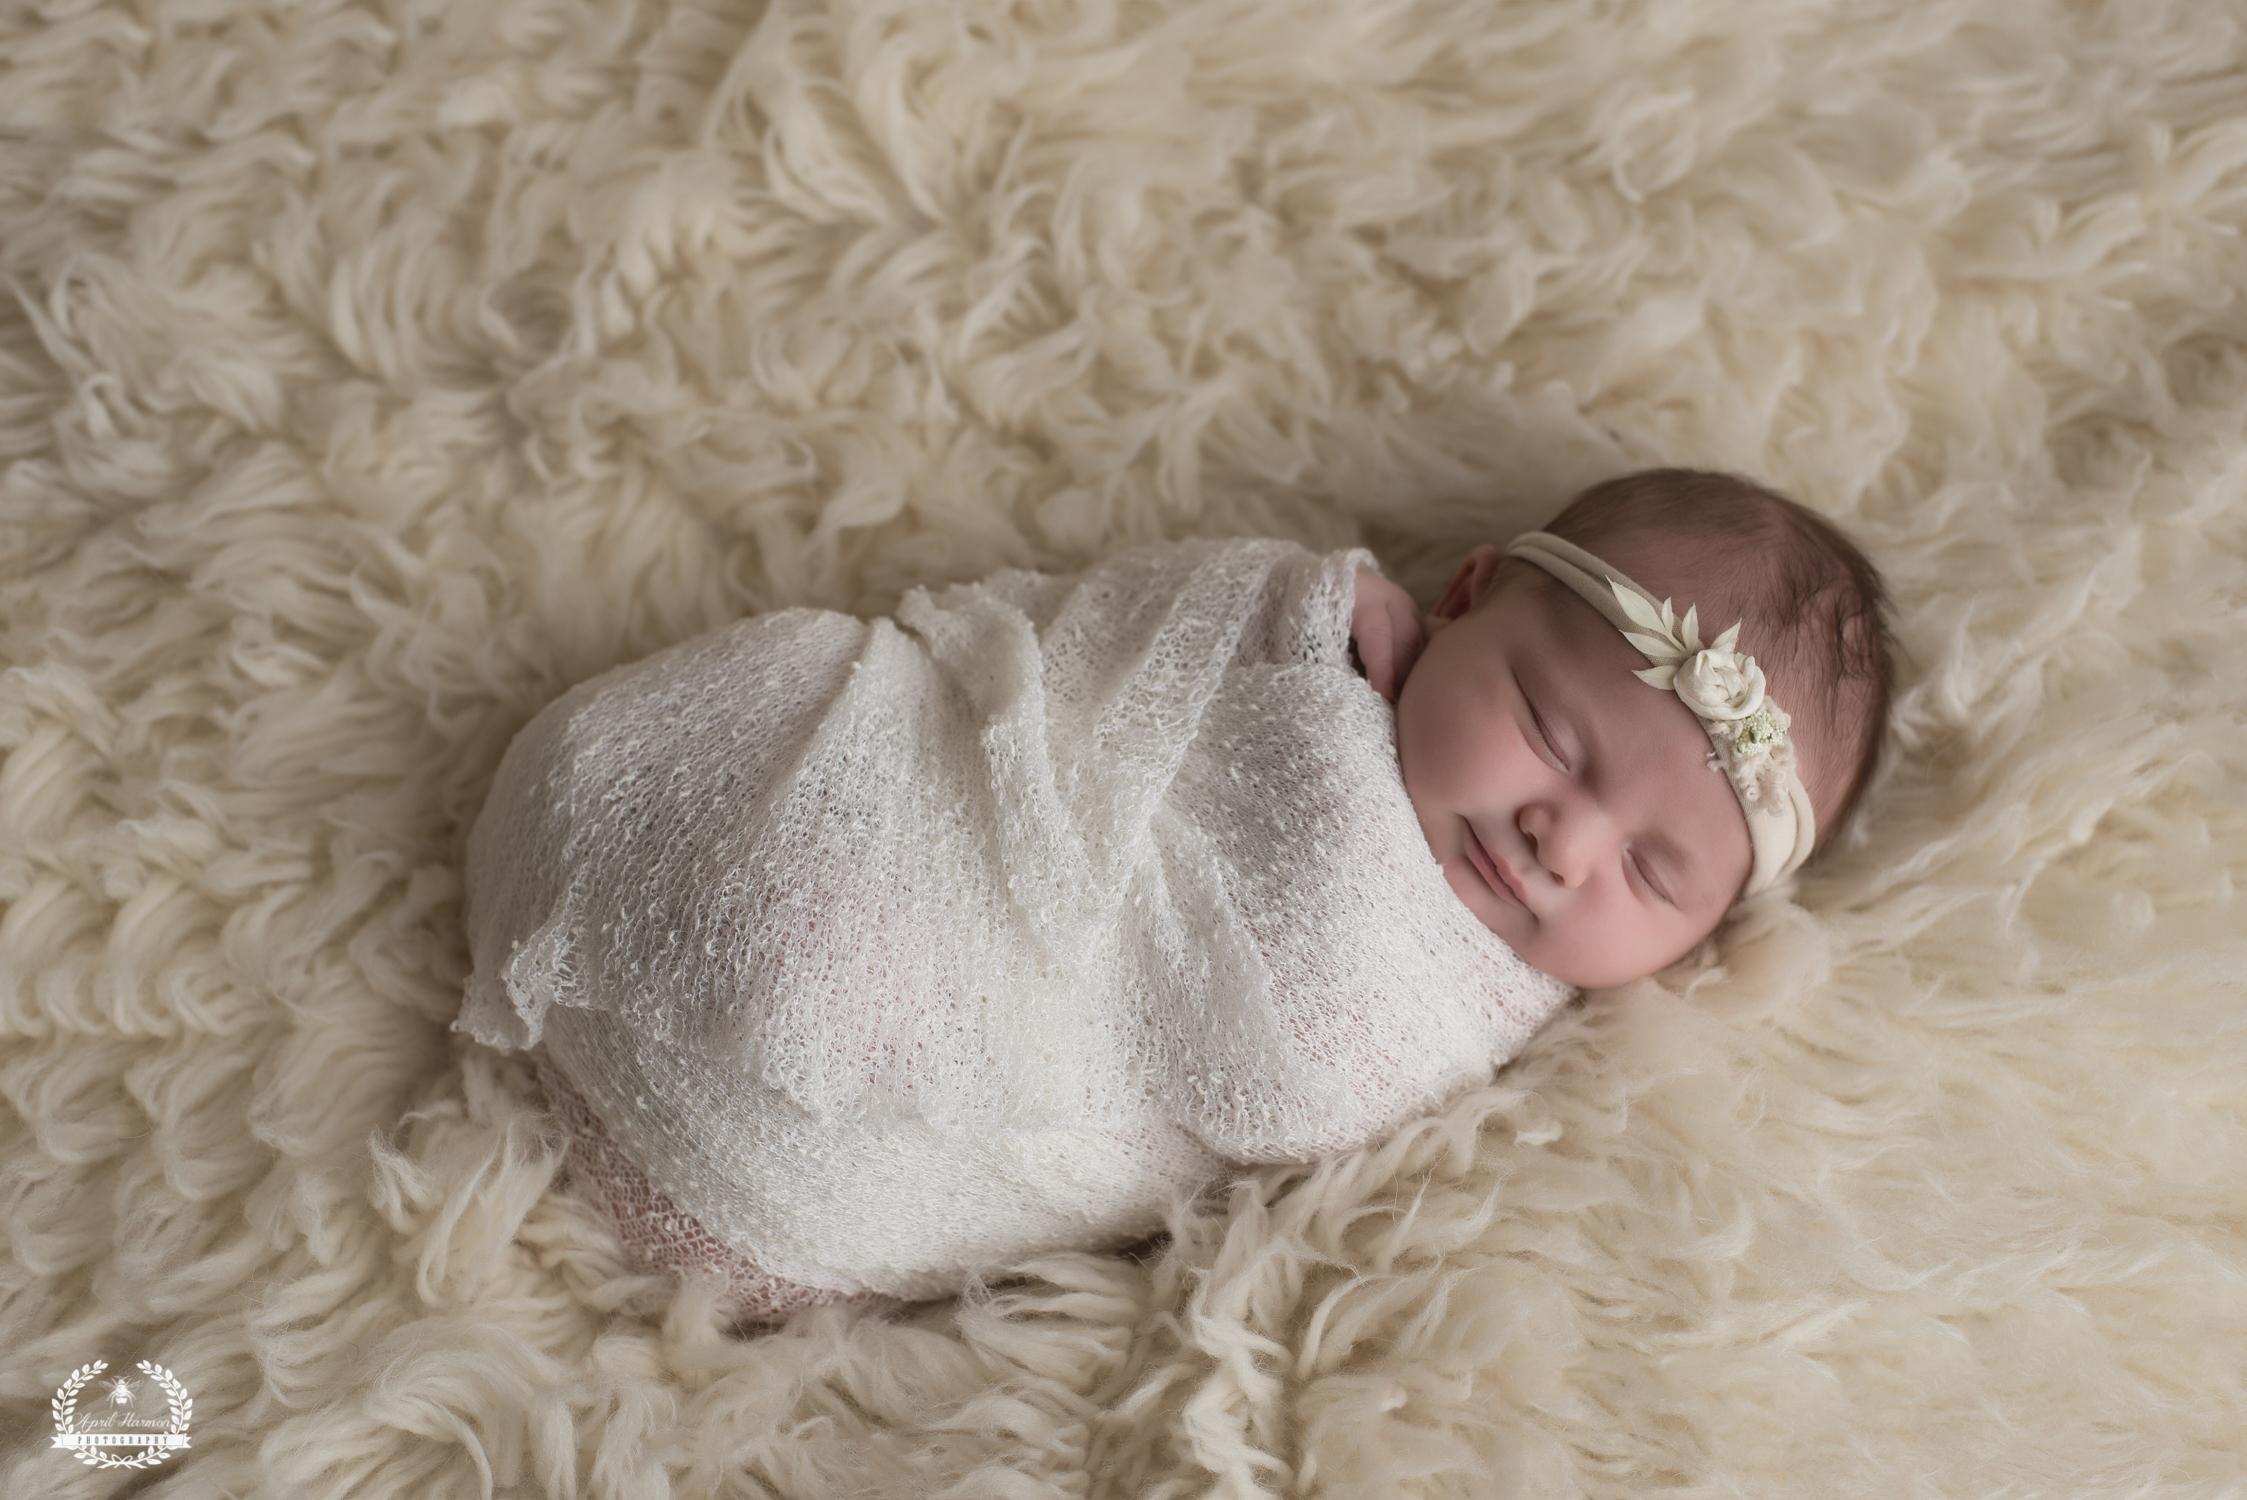 southwest-kansas-newborn-photography1.jpg